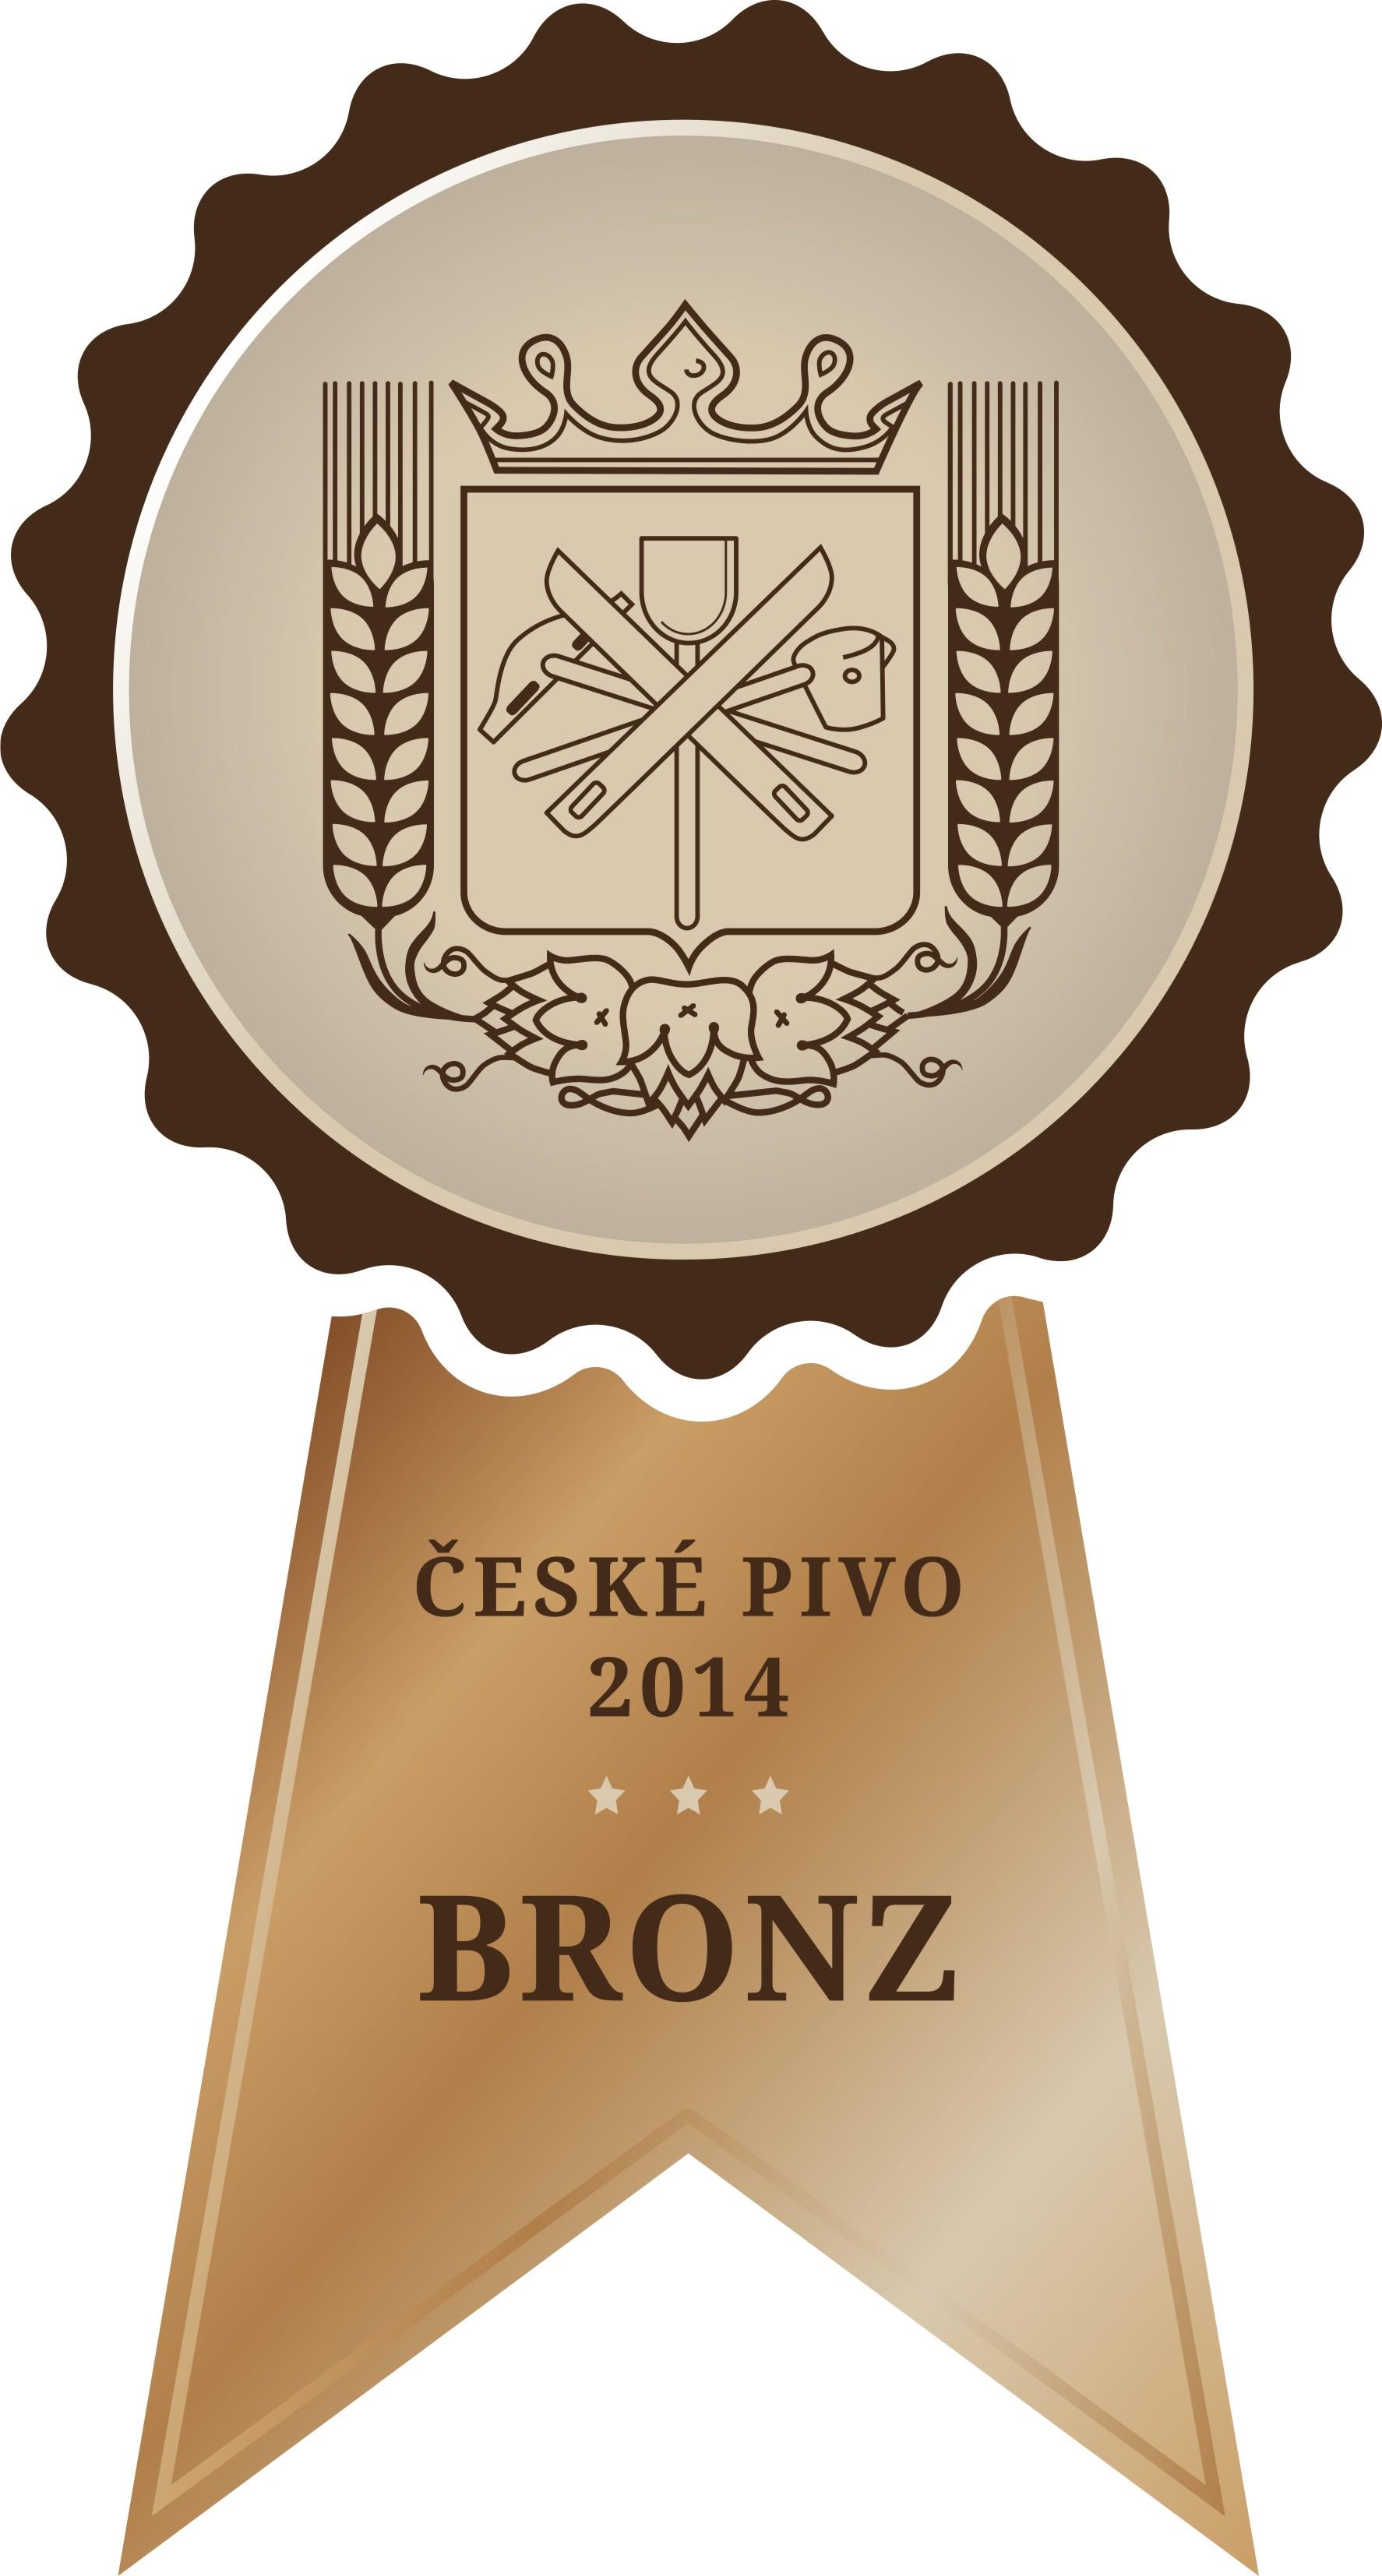 http://primator.cz/wp-content/uploads/2018/03/České-pivo-Praha_2014_bronz.jpg